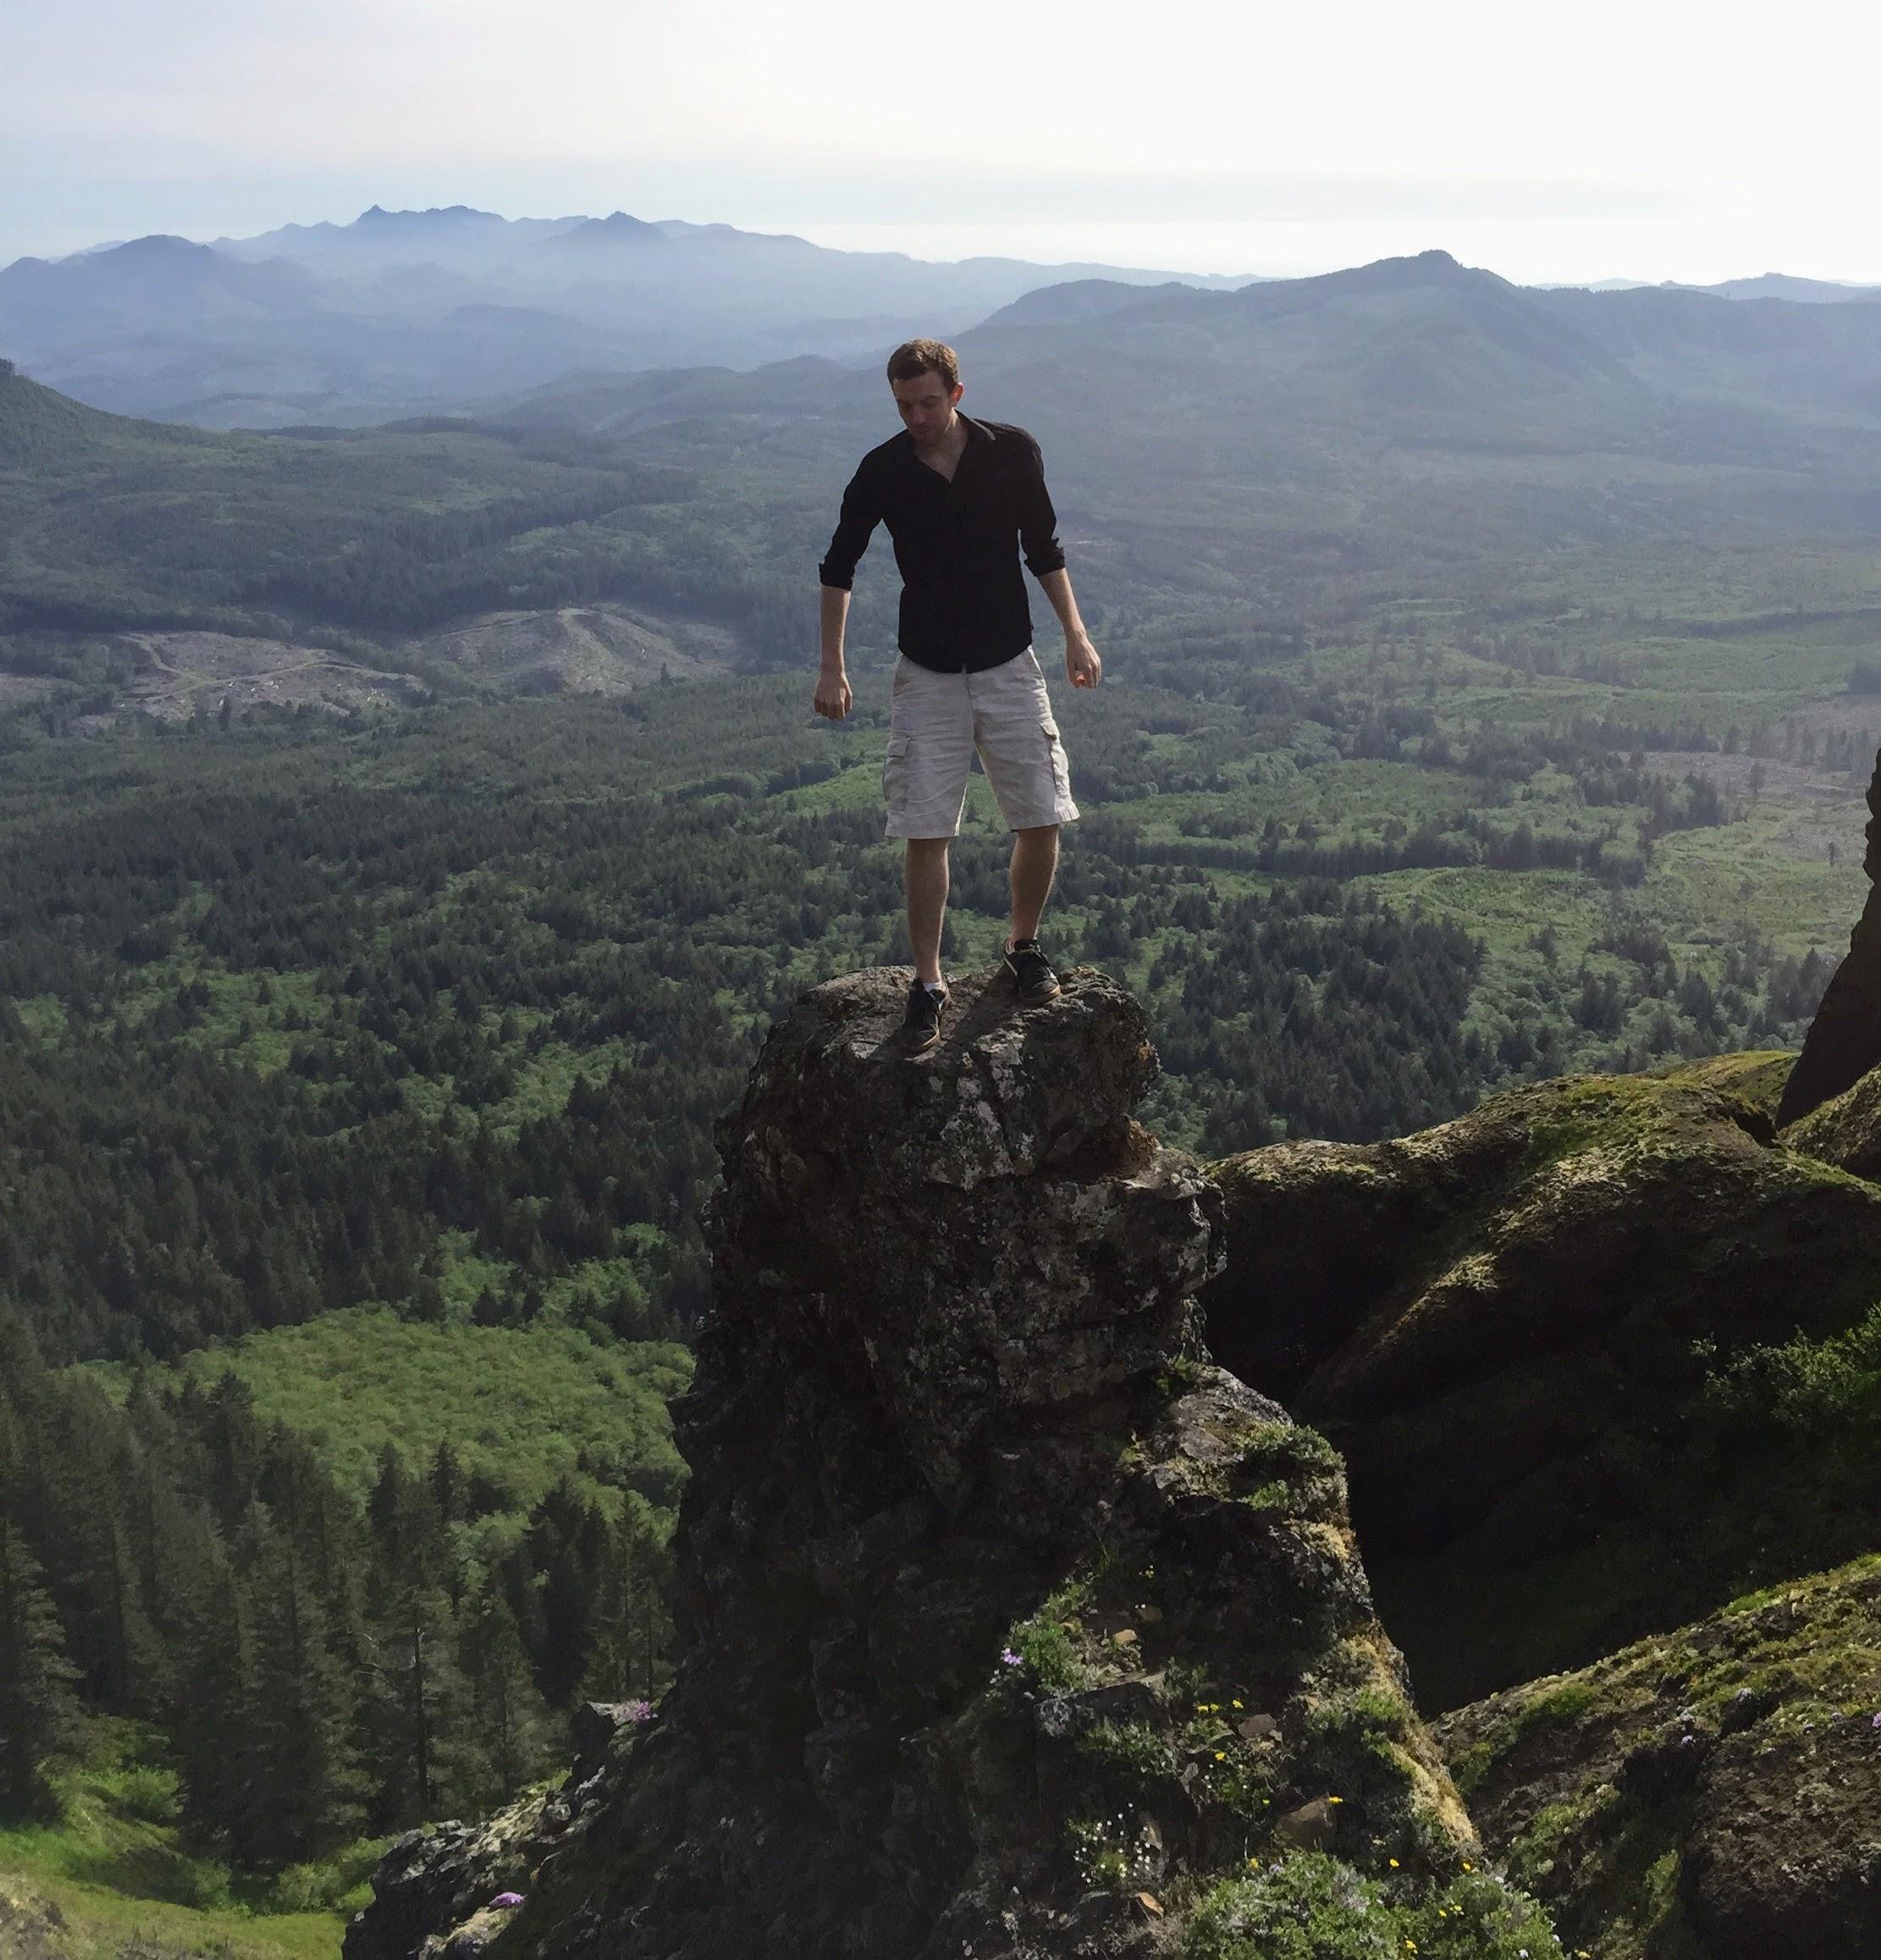 Man standing on peak